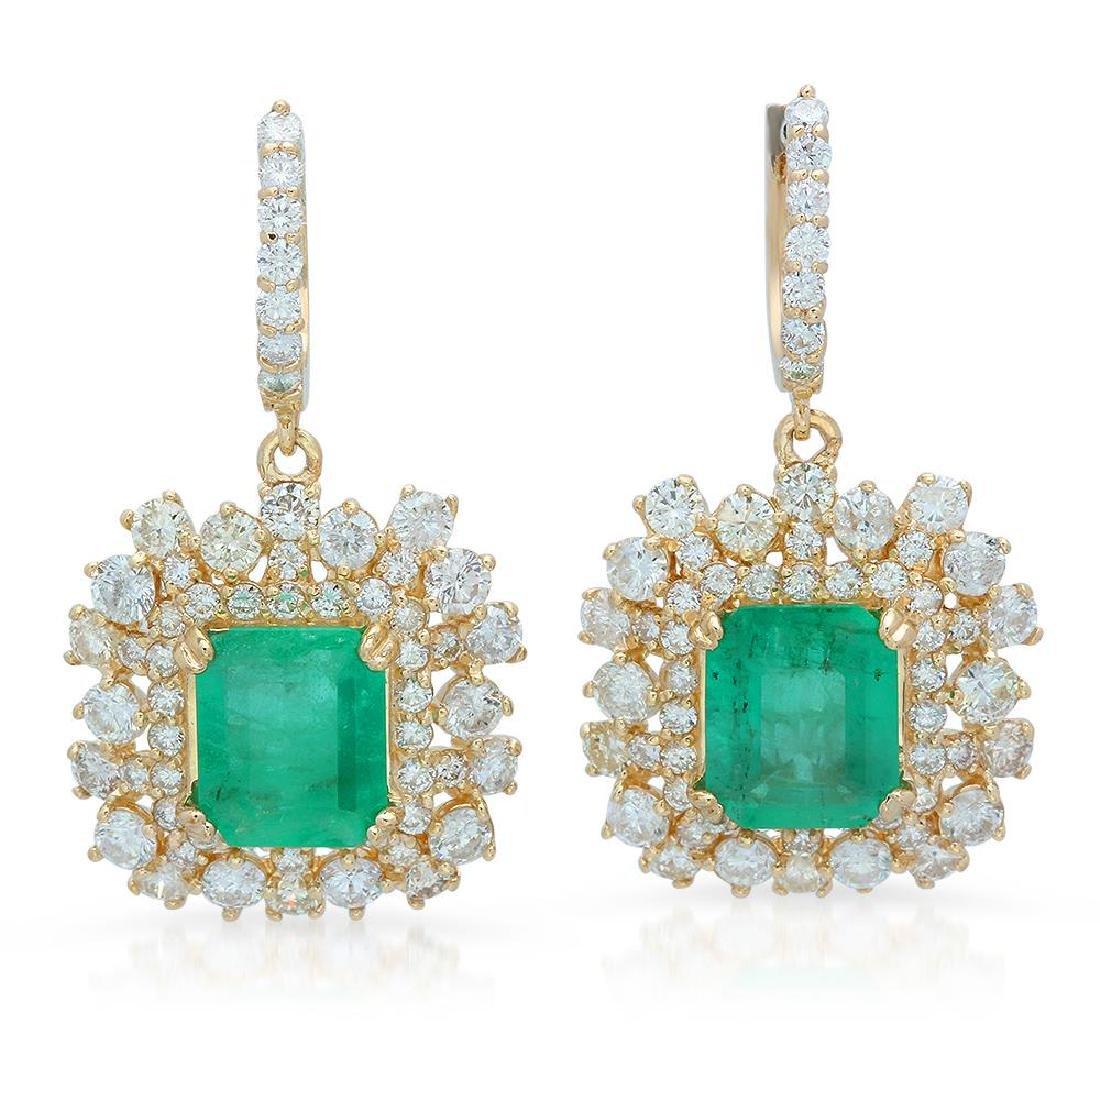 14K Gold 6.28ct Emerald 5.84ct Diamond Earrings